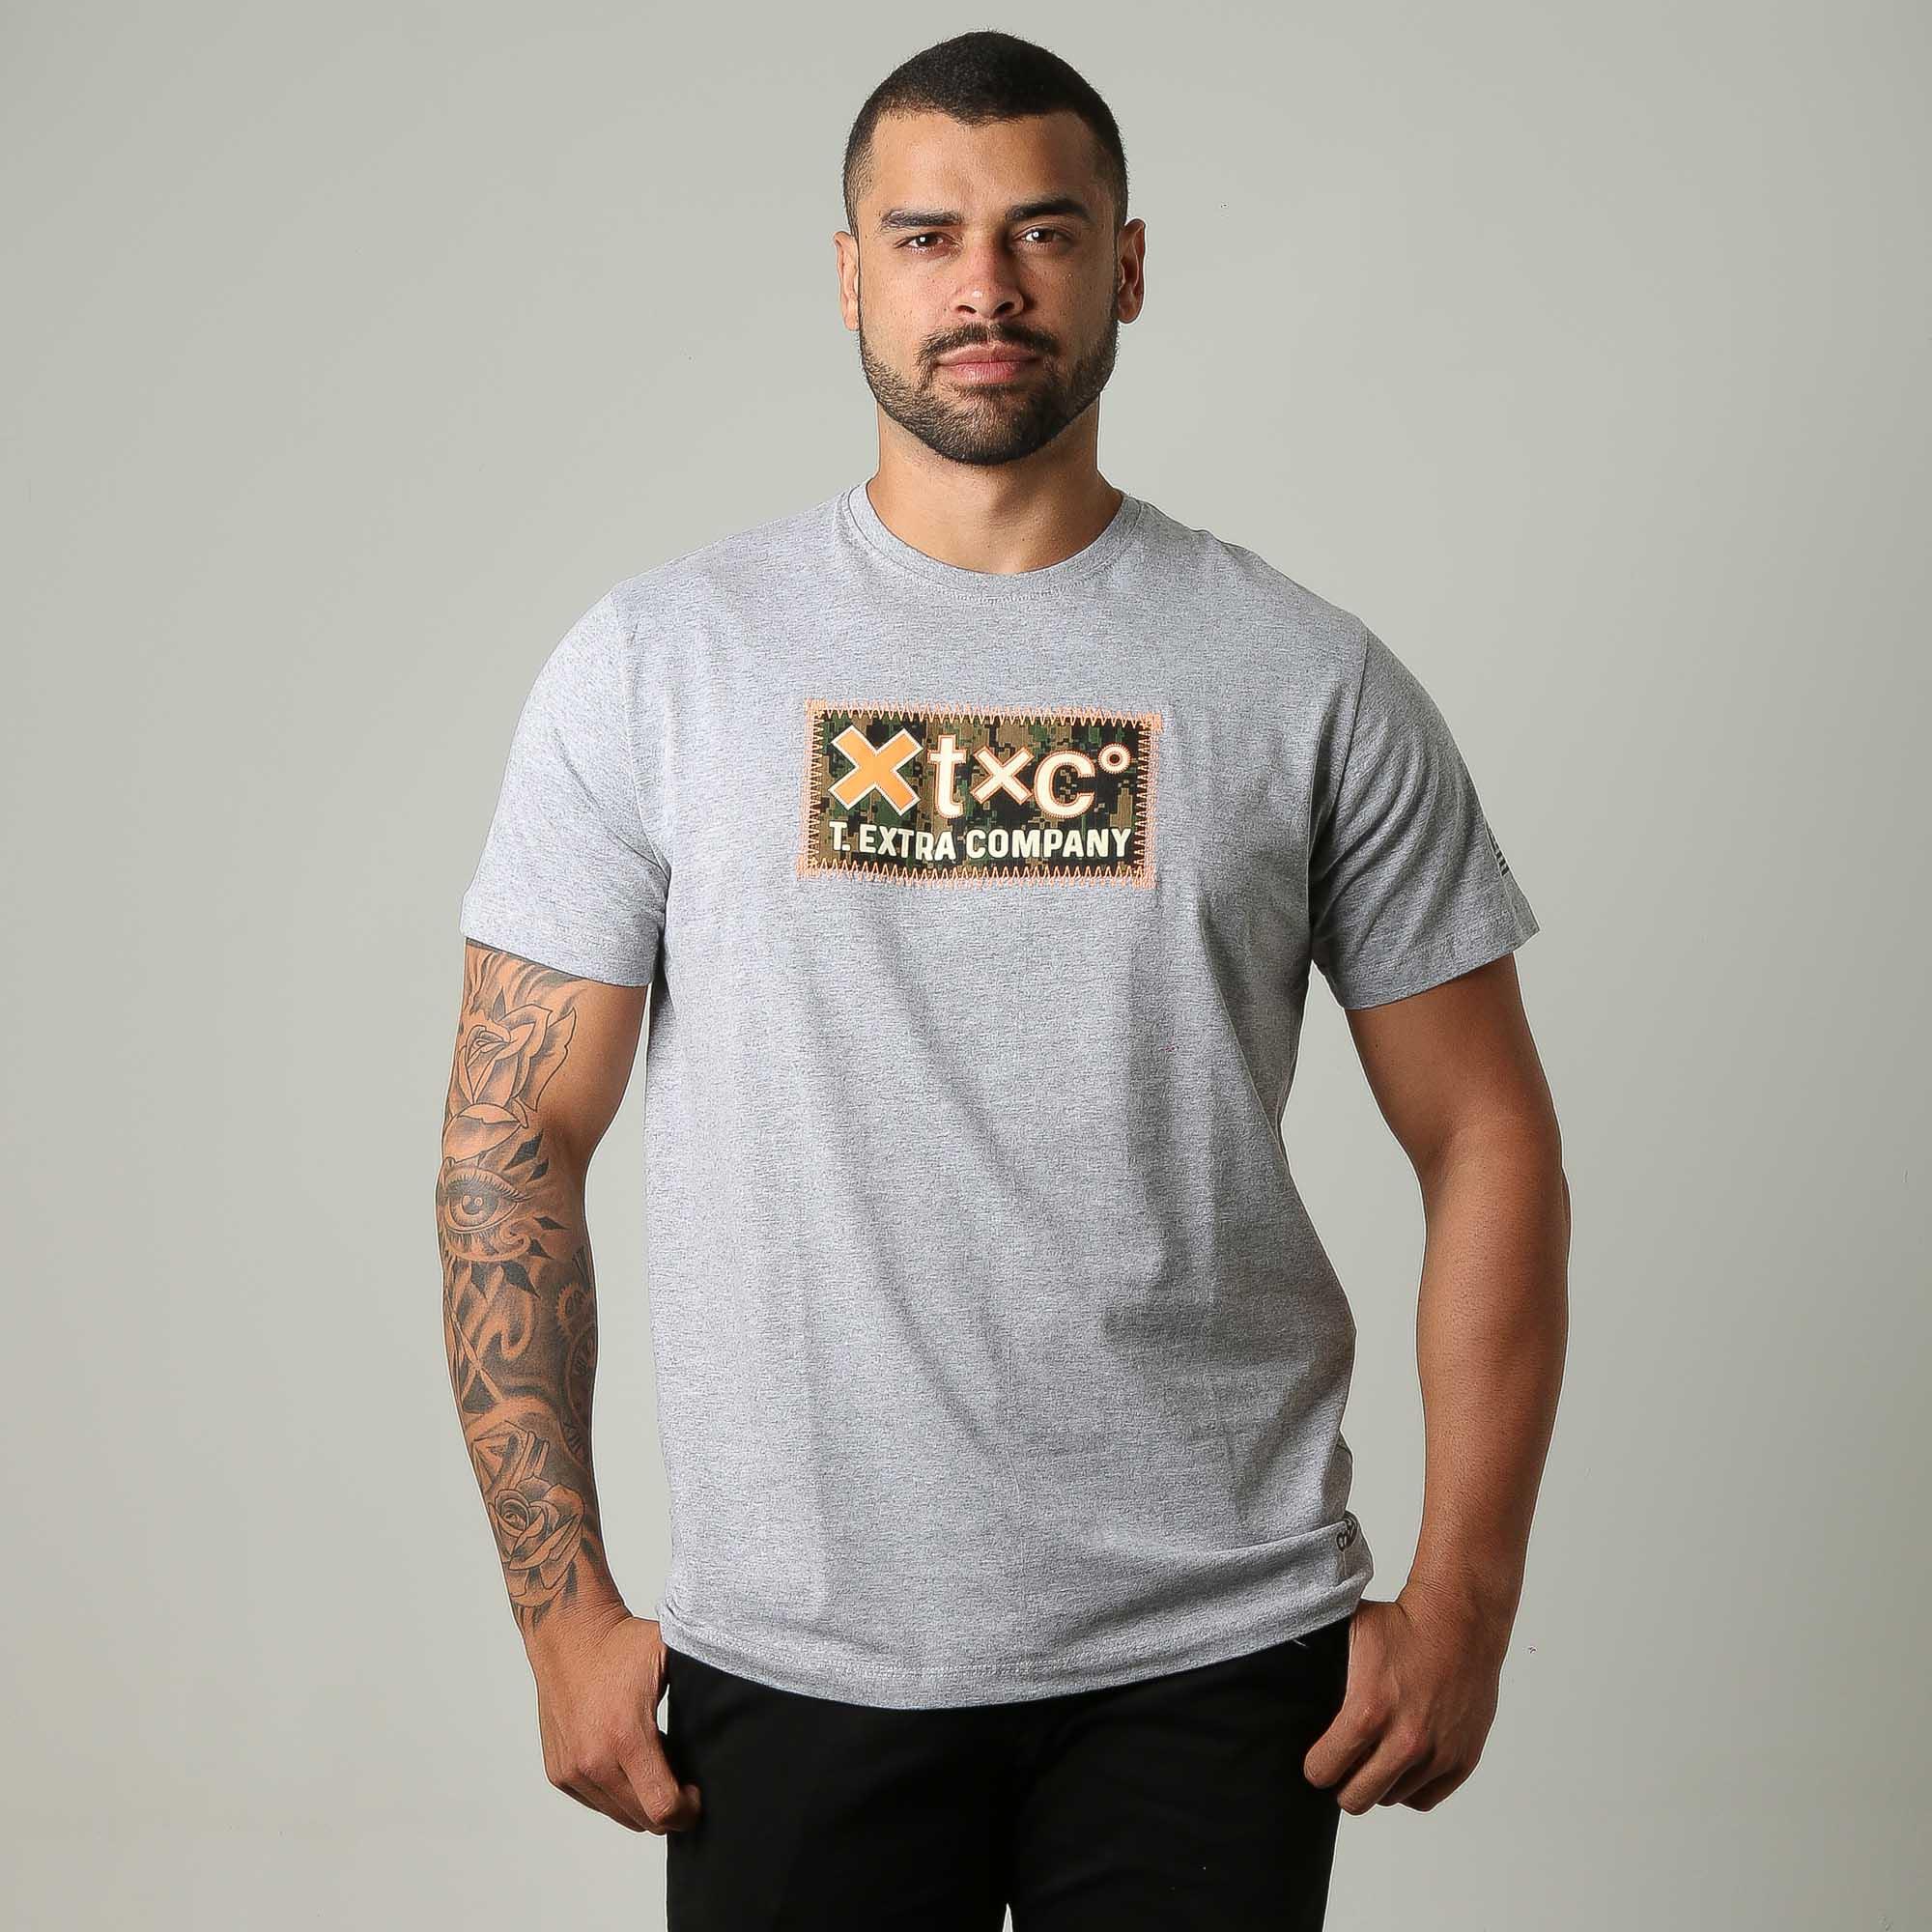 Camiseta Masculina TXC 1829